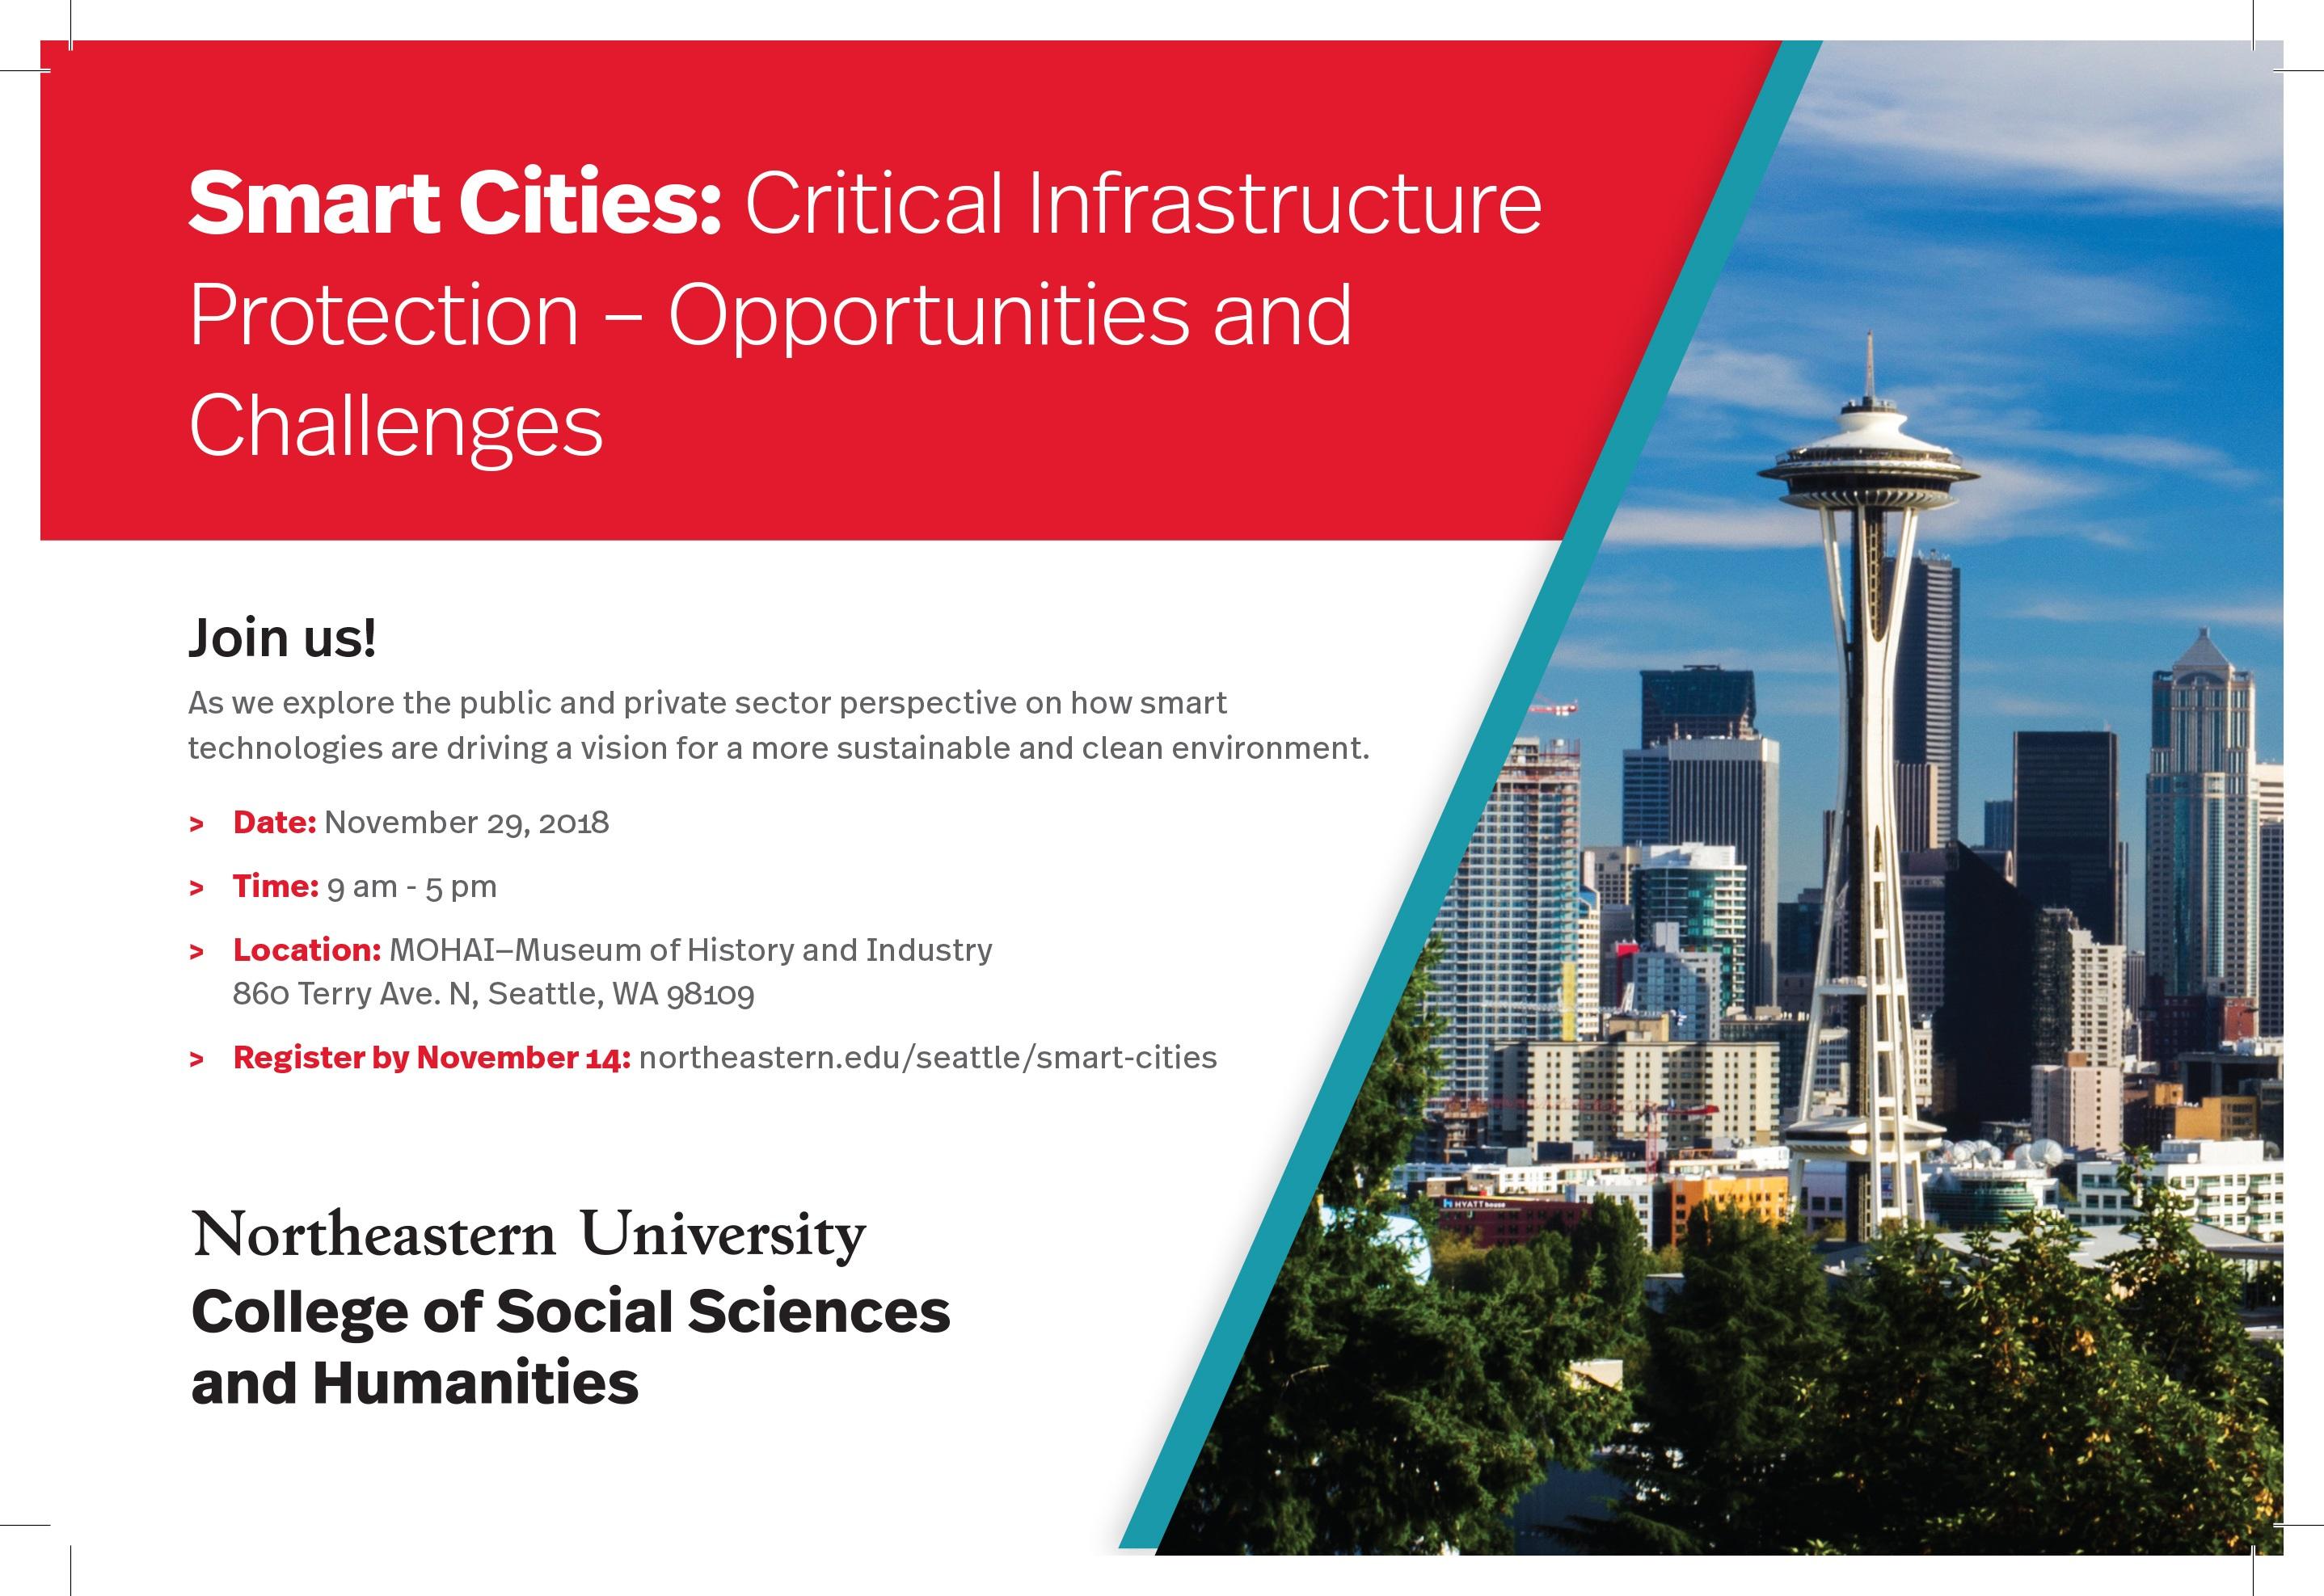 Smart Cities Infrastructure Protection Opportunities Challenges